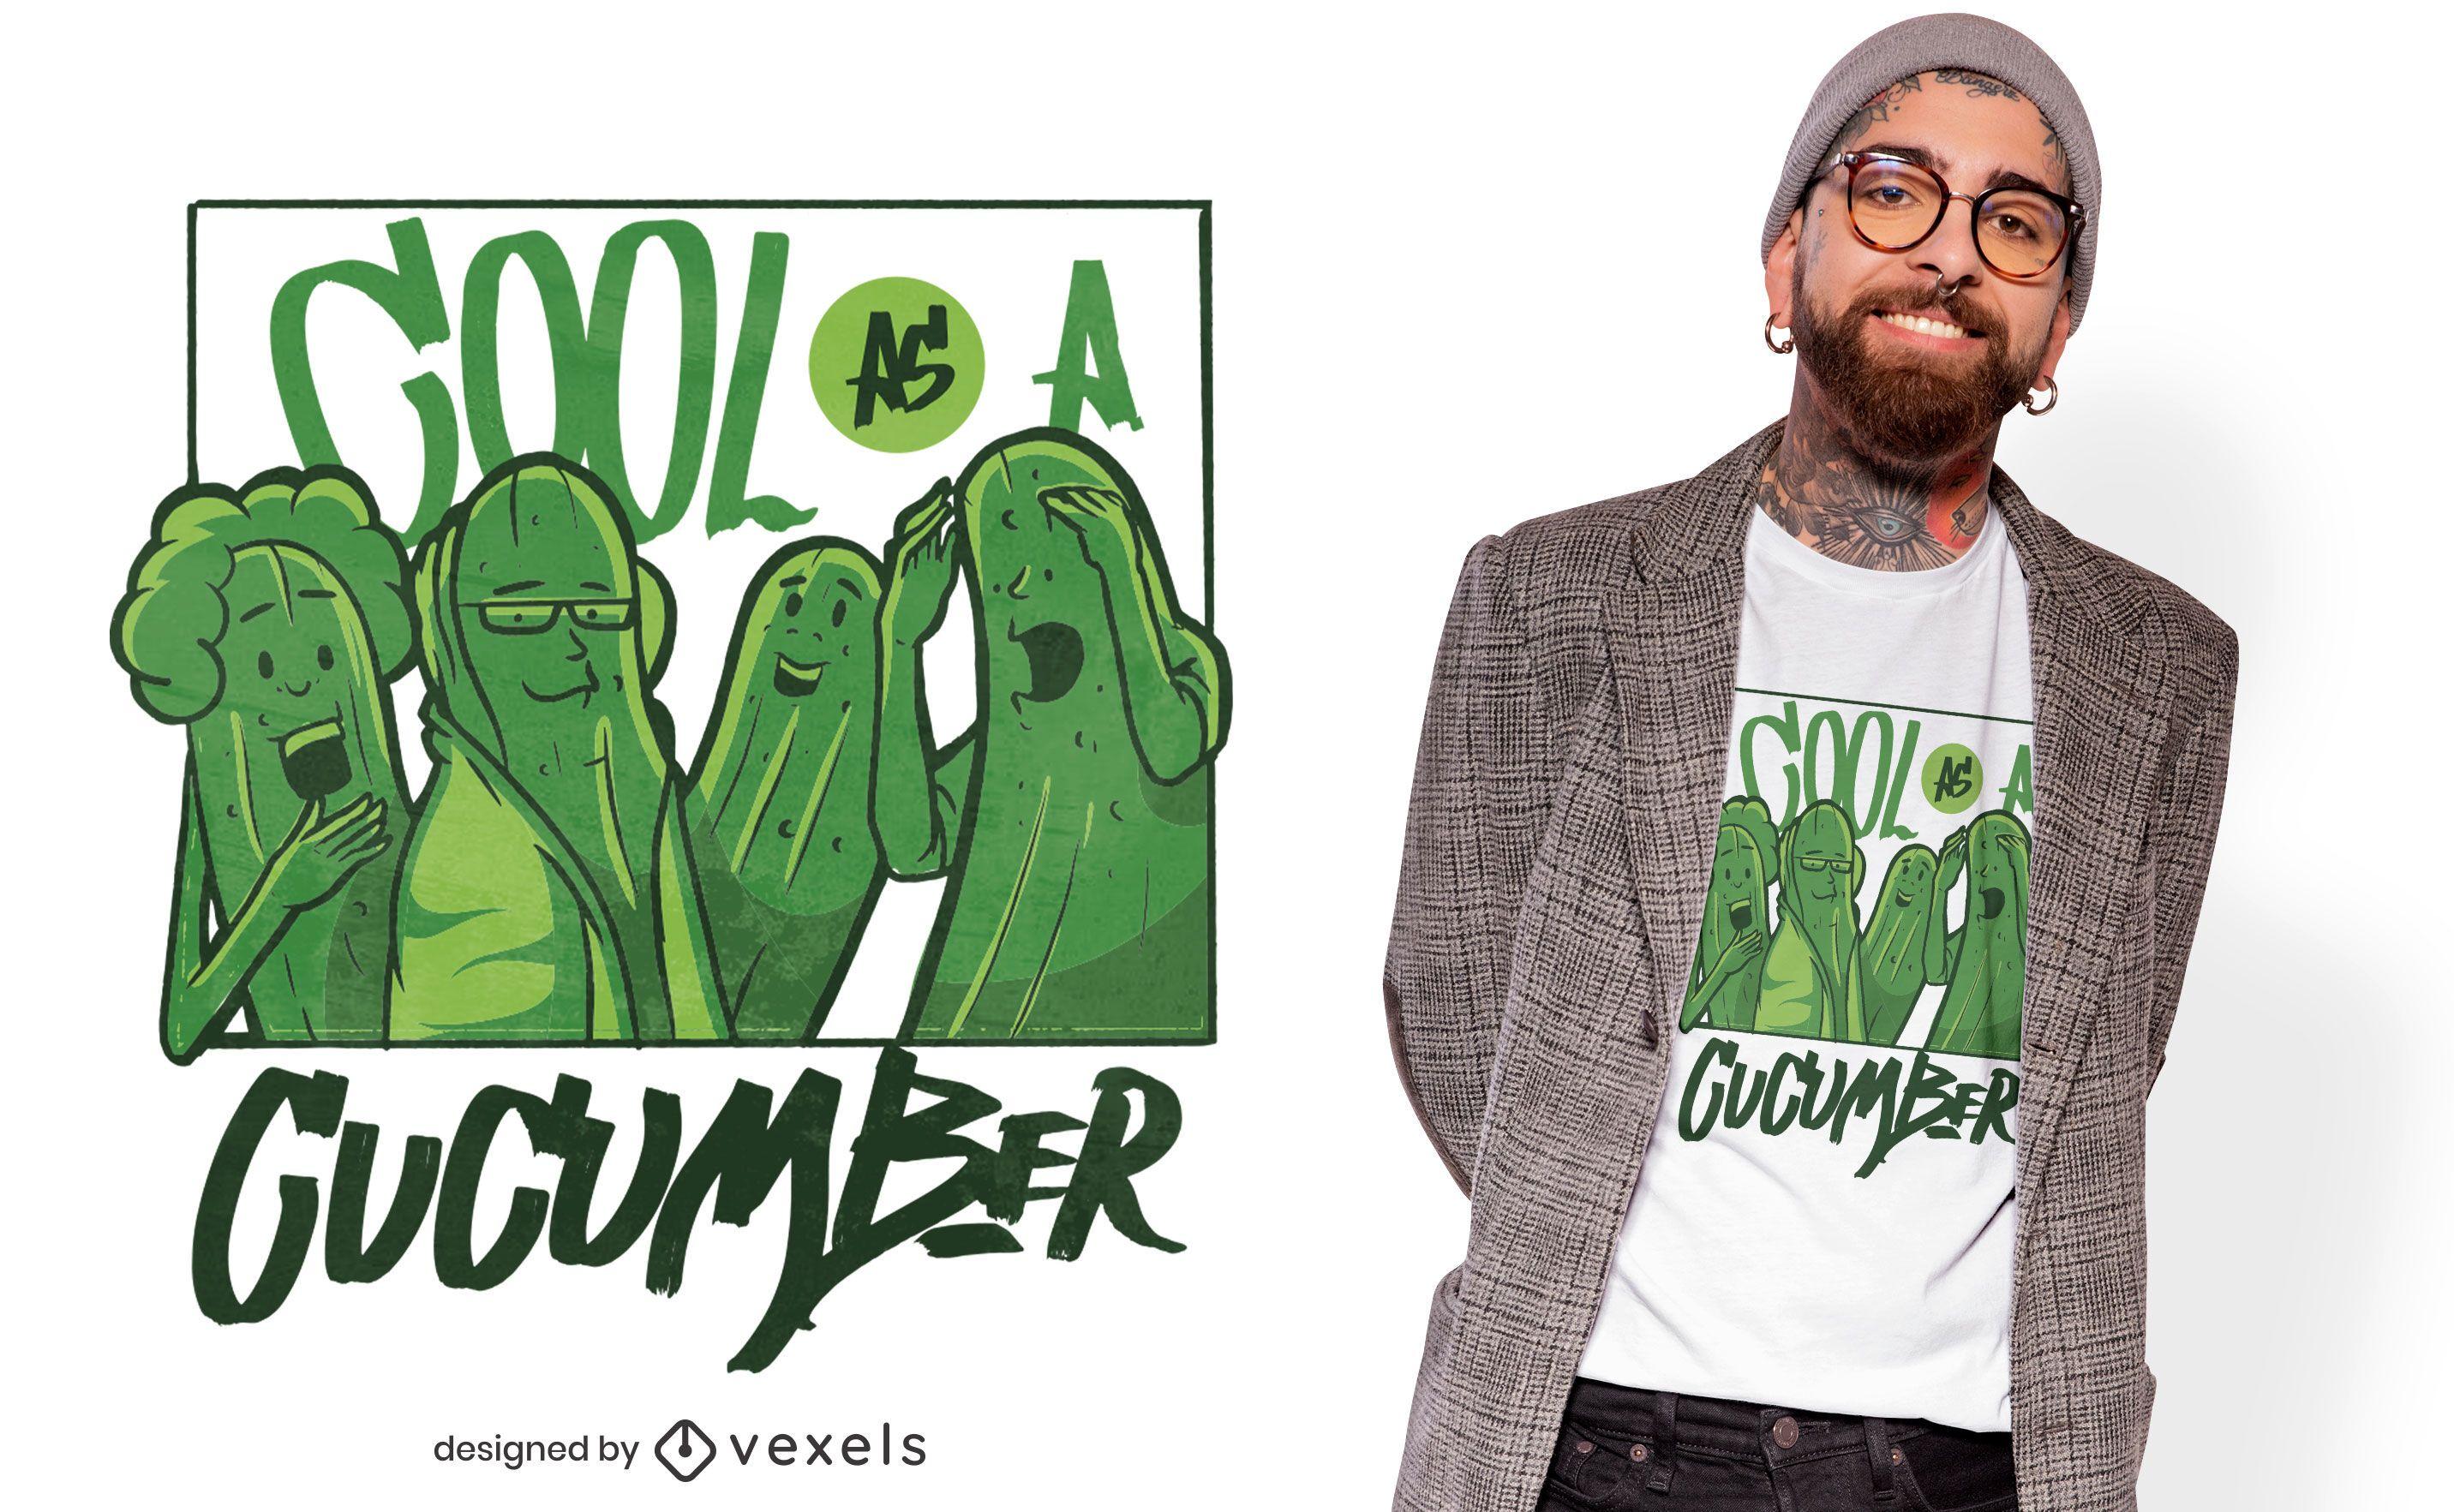 Cool cucumbers t-shirt design